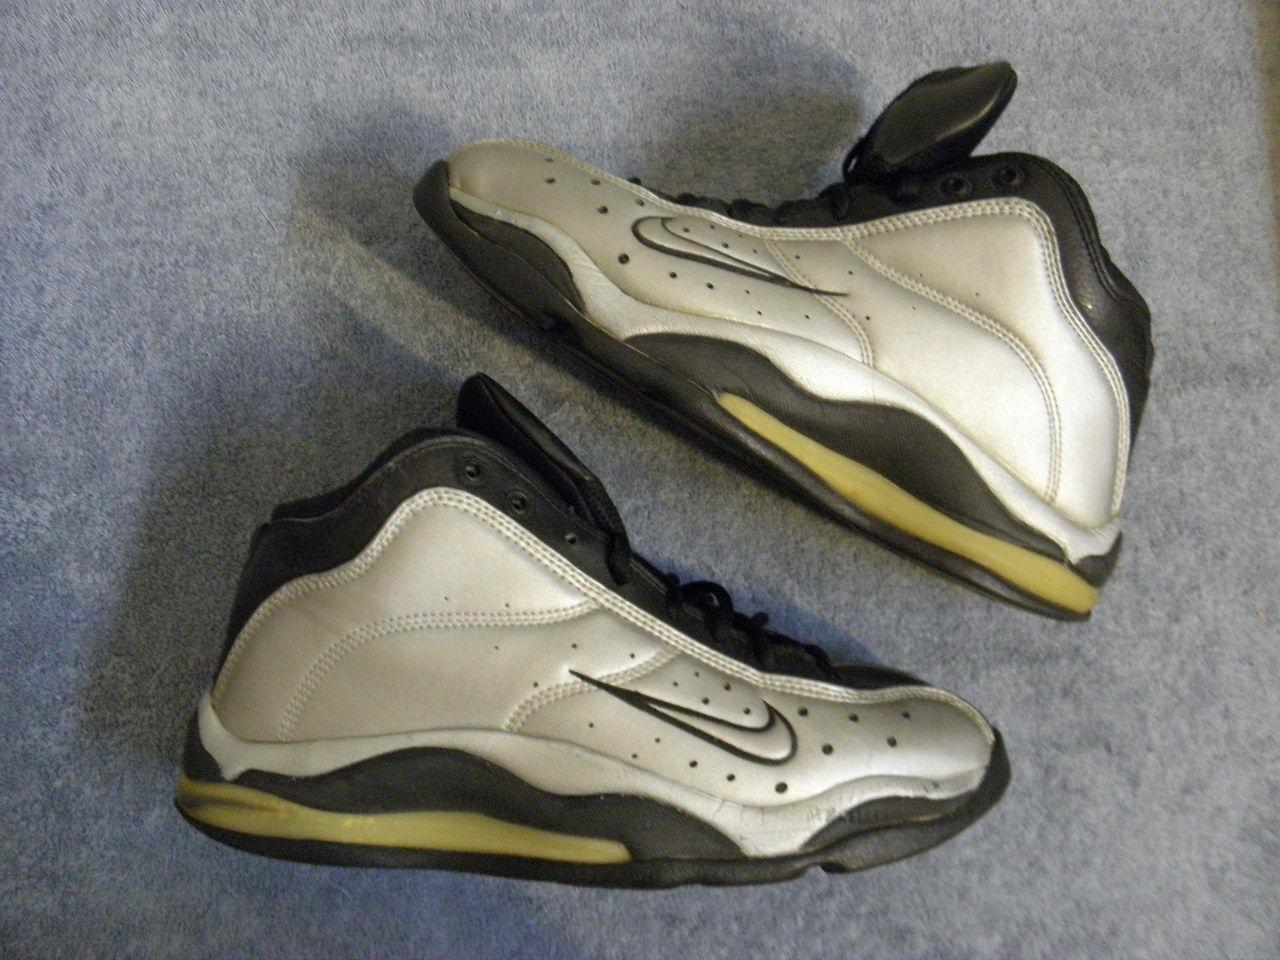 Nike Air Team Max Zoom MaxZoom 1998 Vintage Original OG EUC NDS black silver 11 Seasonal price cuts, discount benefits